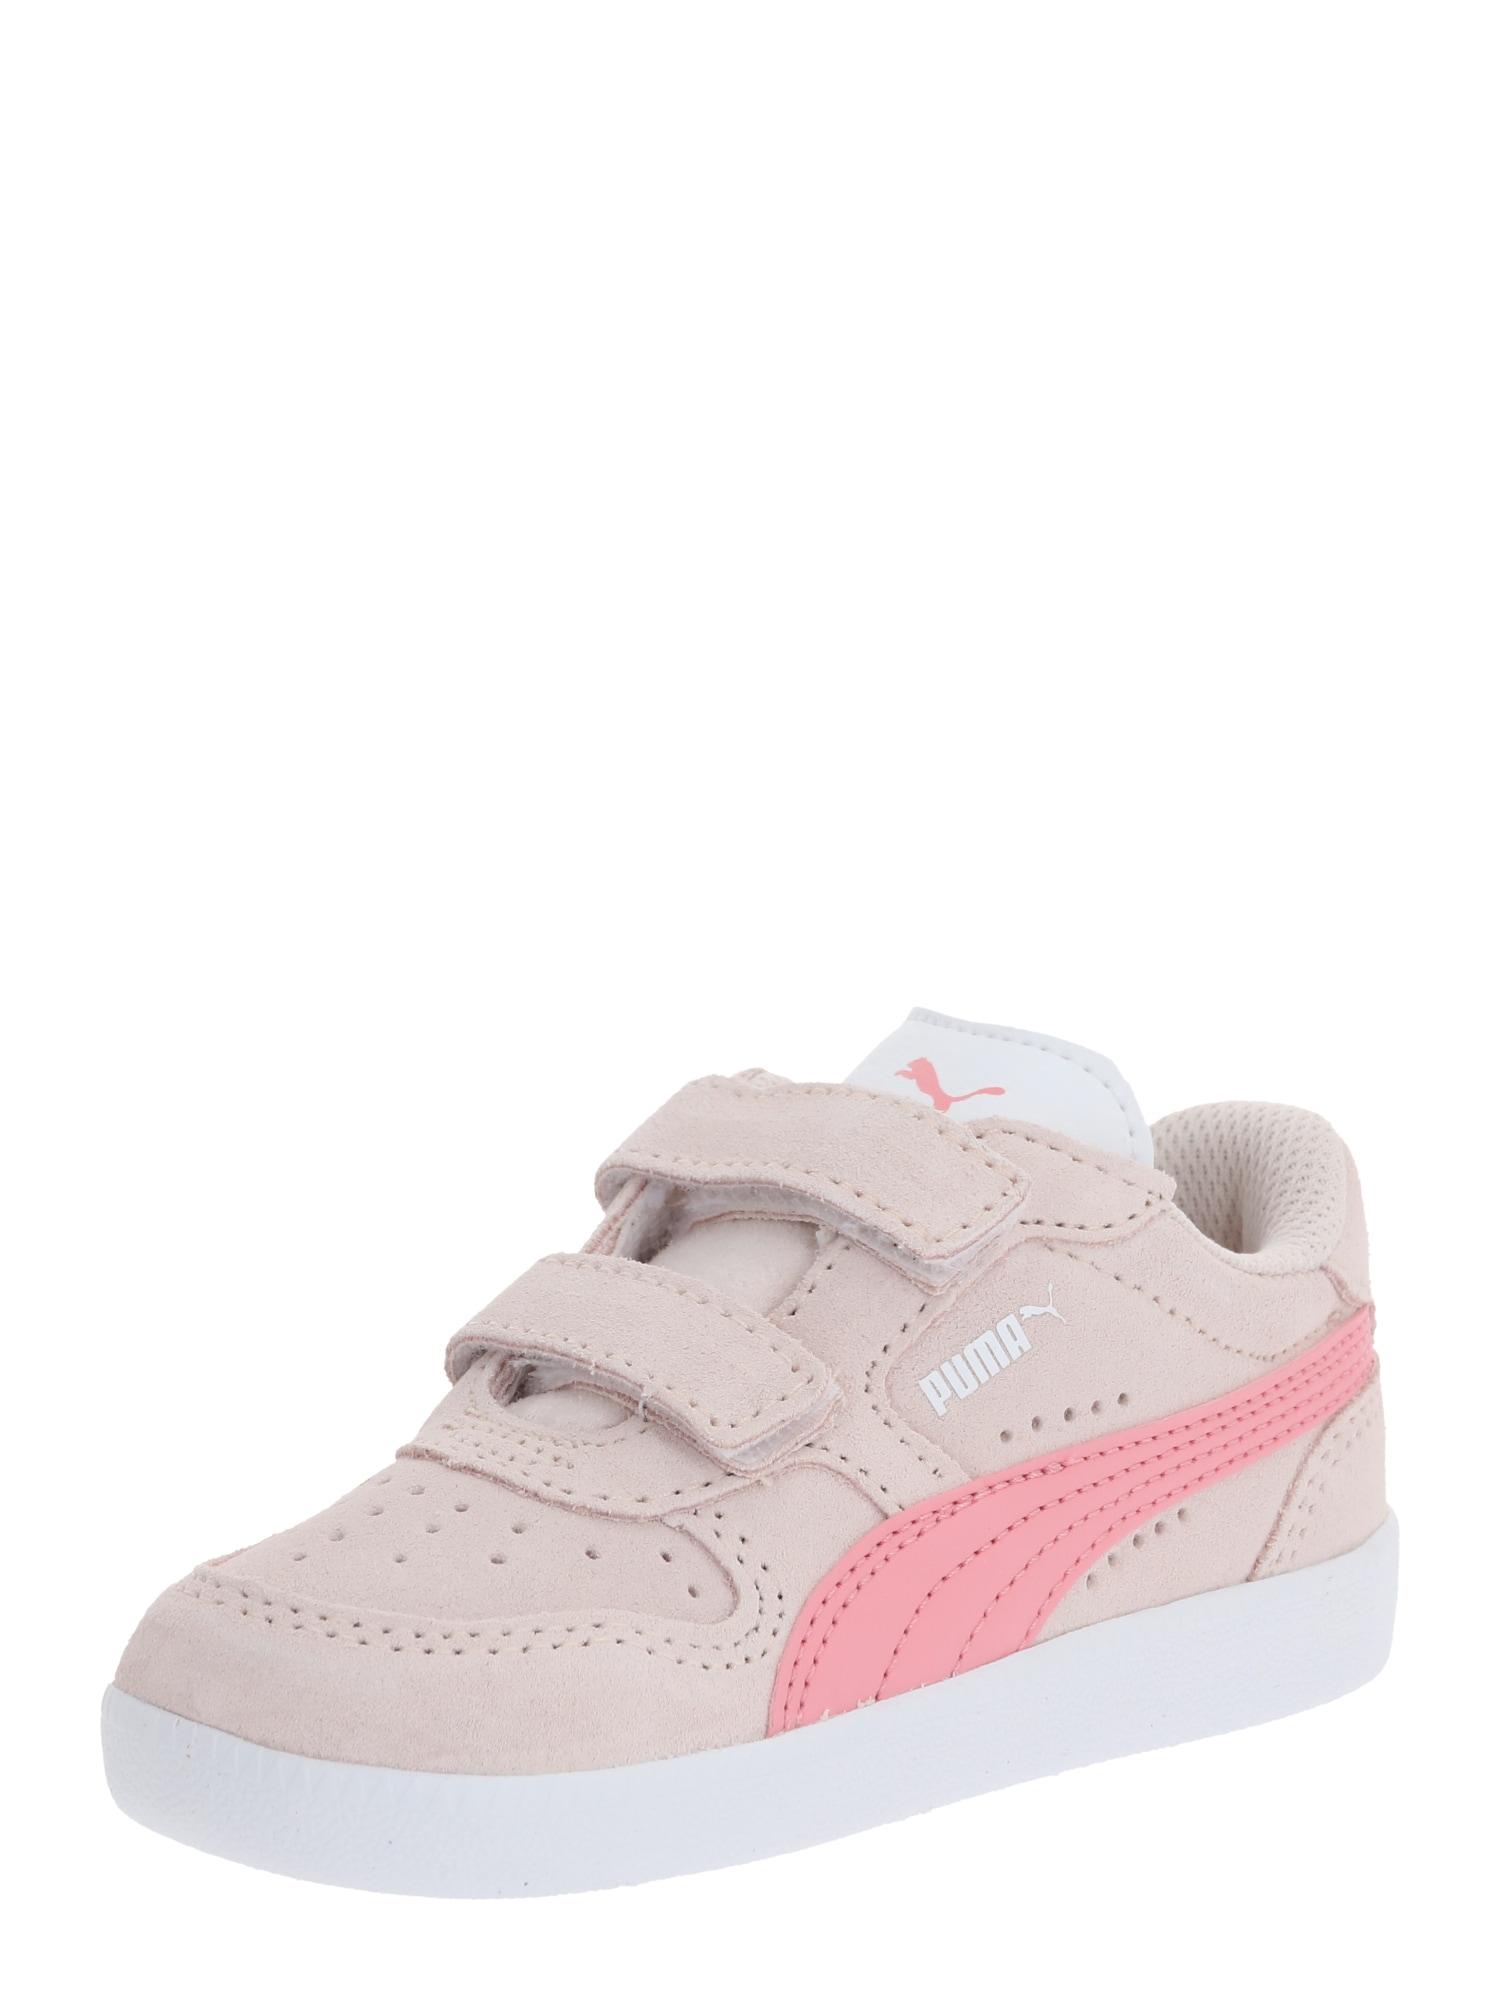 PUMA Sneaker 'Icra'  biela / ružová